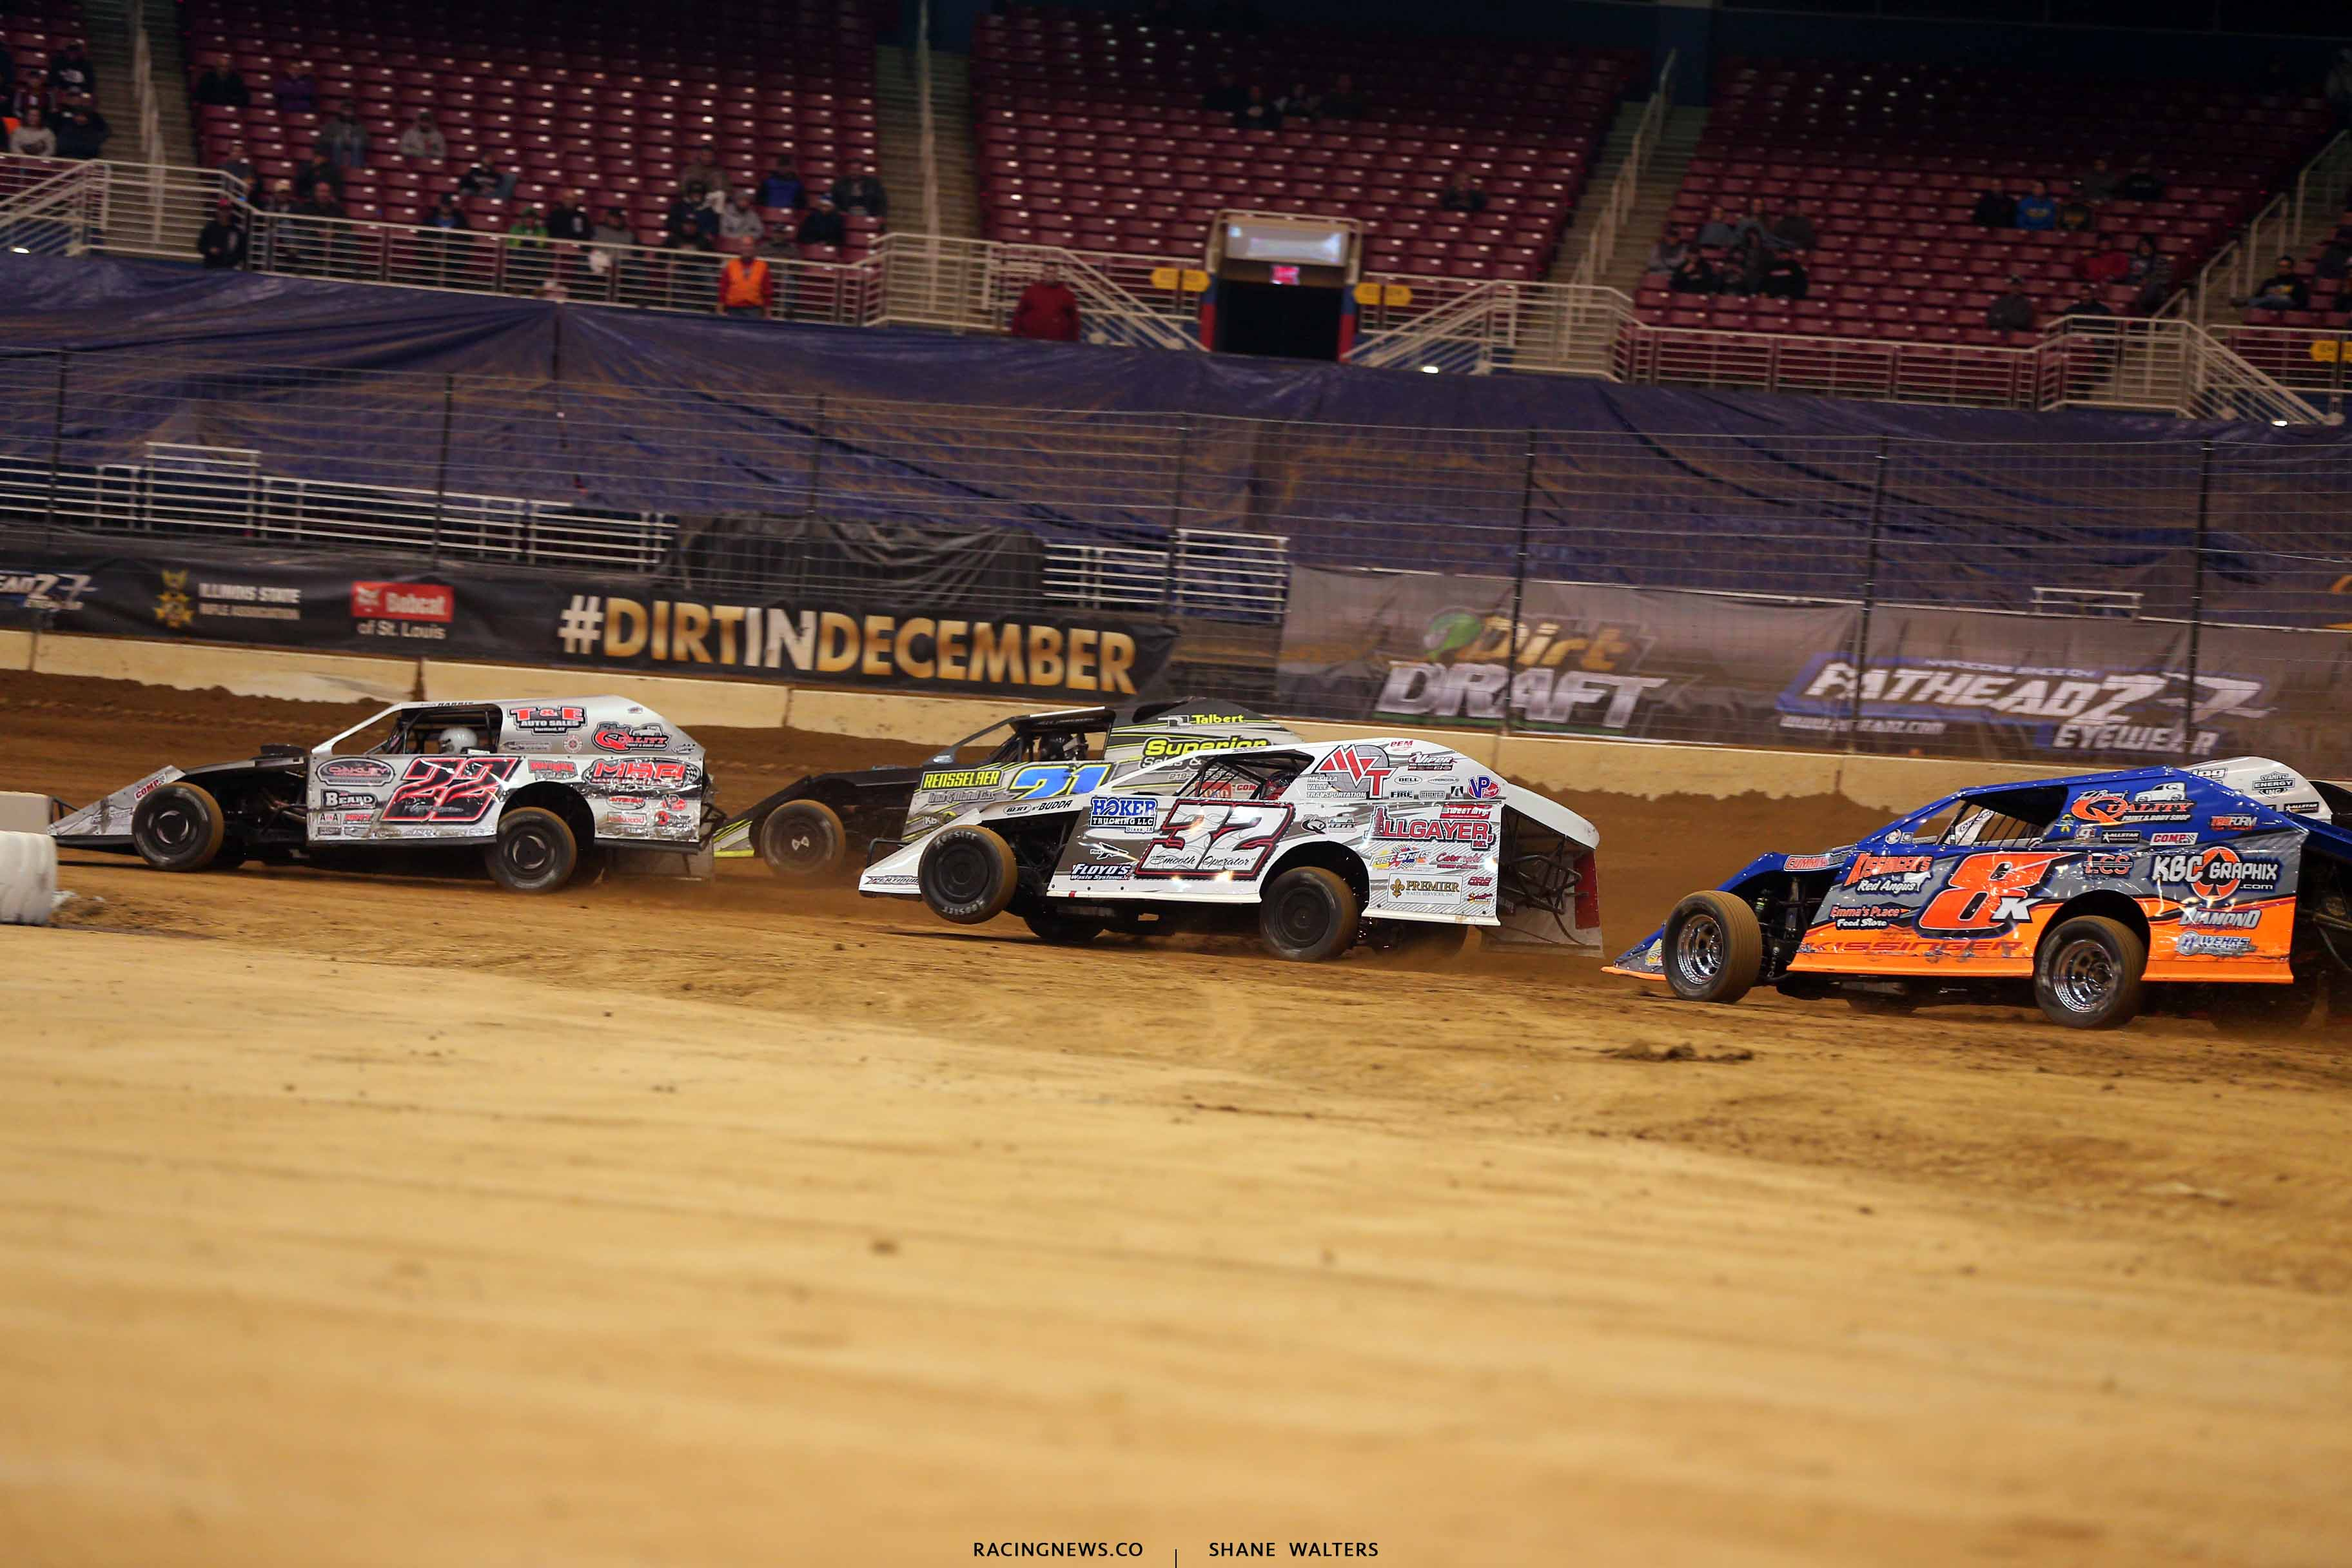 Josh Harris, Derek Losh and Bobby Pierce in the Gateway Dirt Nationals - Dirt Modifieds 2089